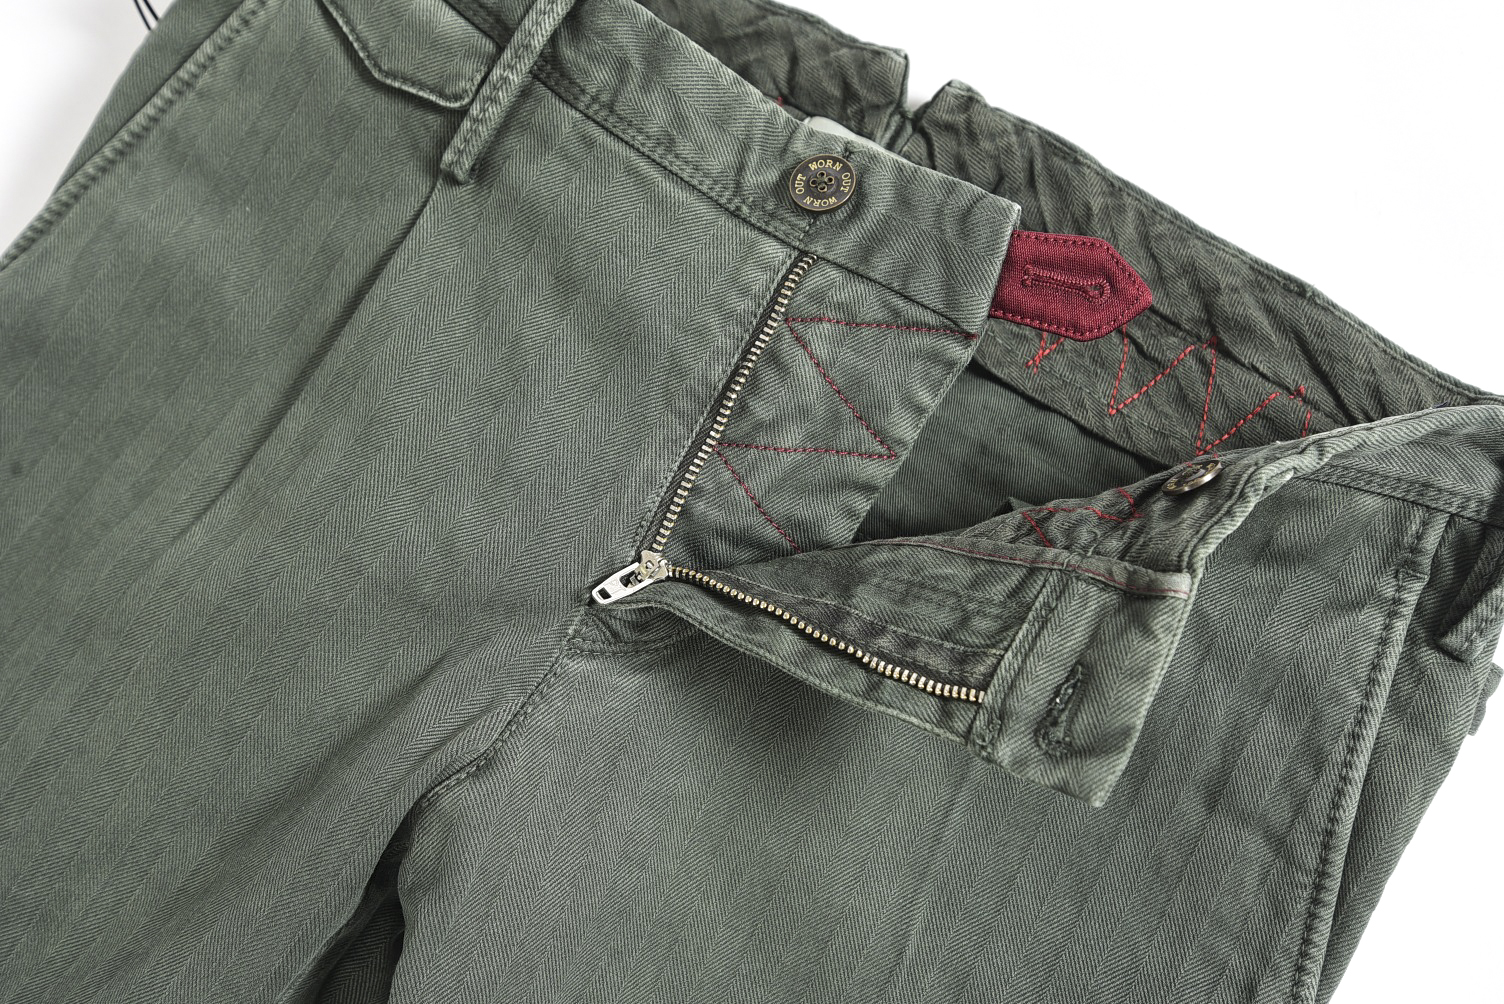 Jack /& jones jeans pour homme tim slim étroit tapered leg denim pantalon vintage bleu